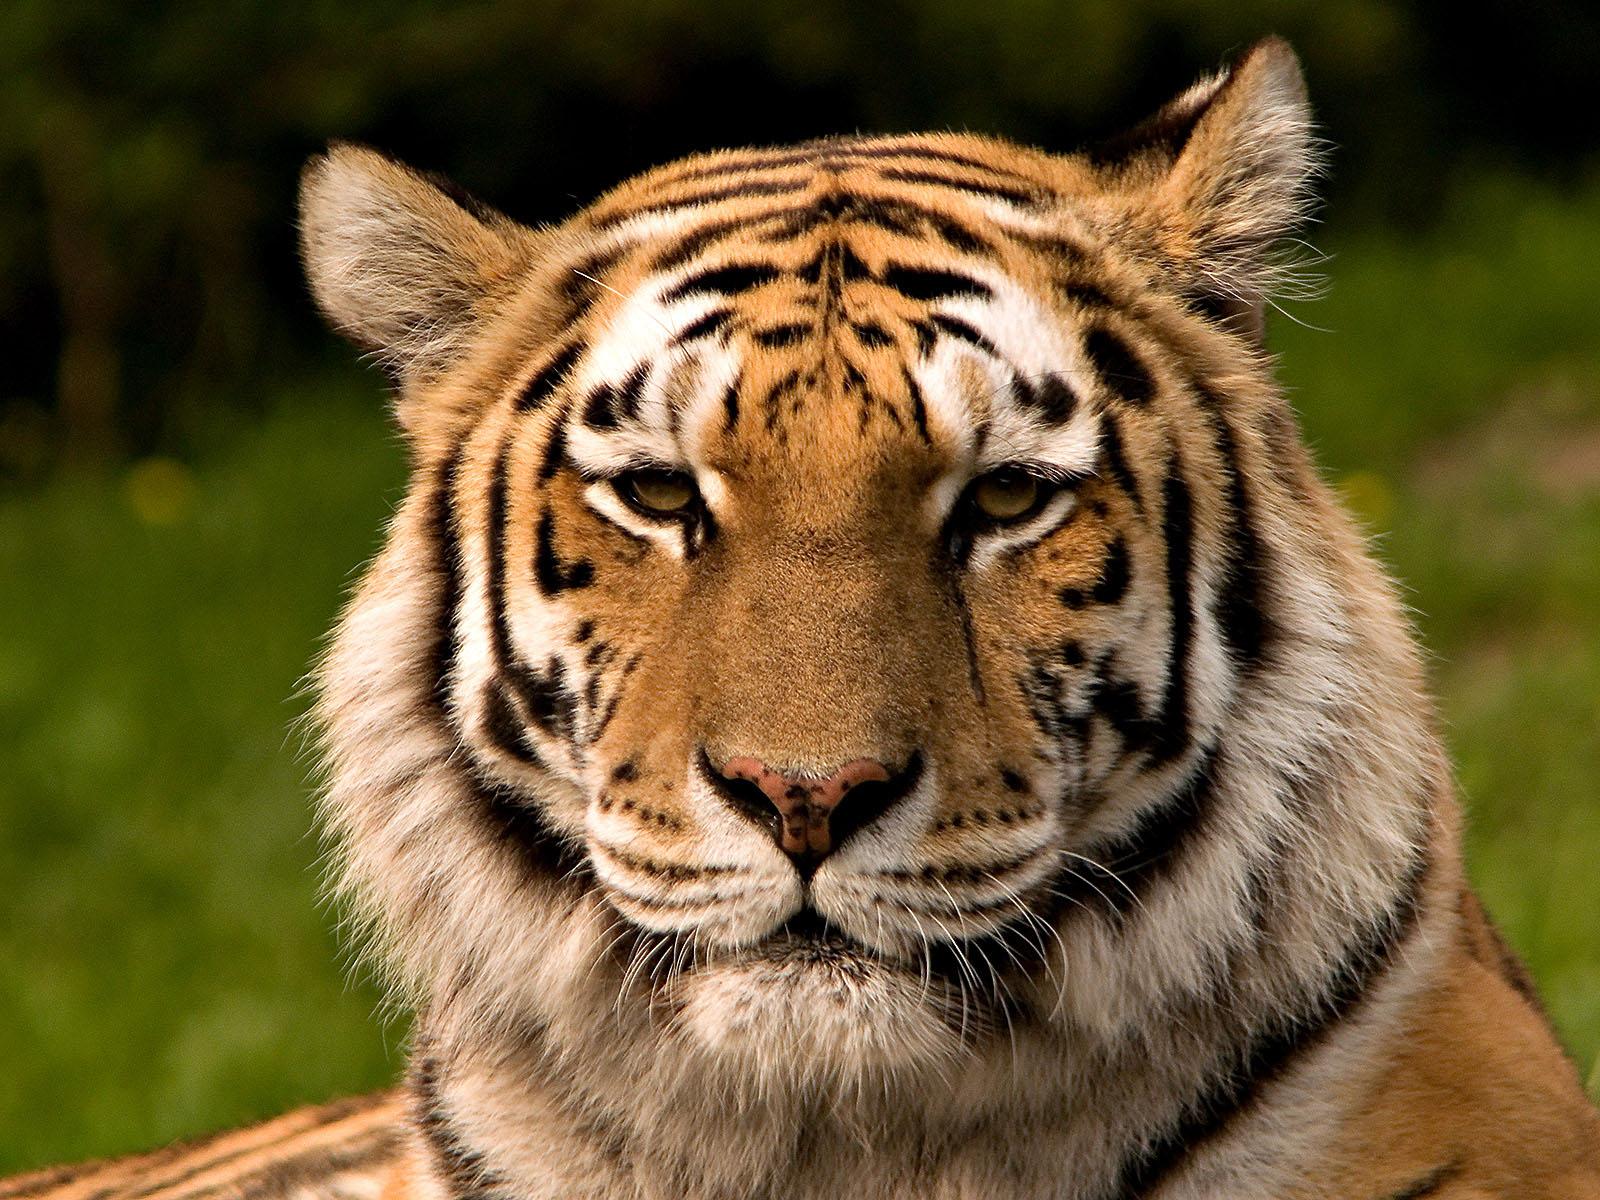 В «Тайган» доставили трех амурских тигров